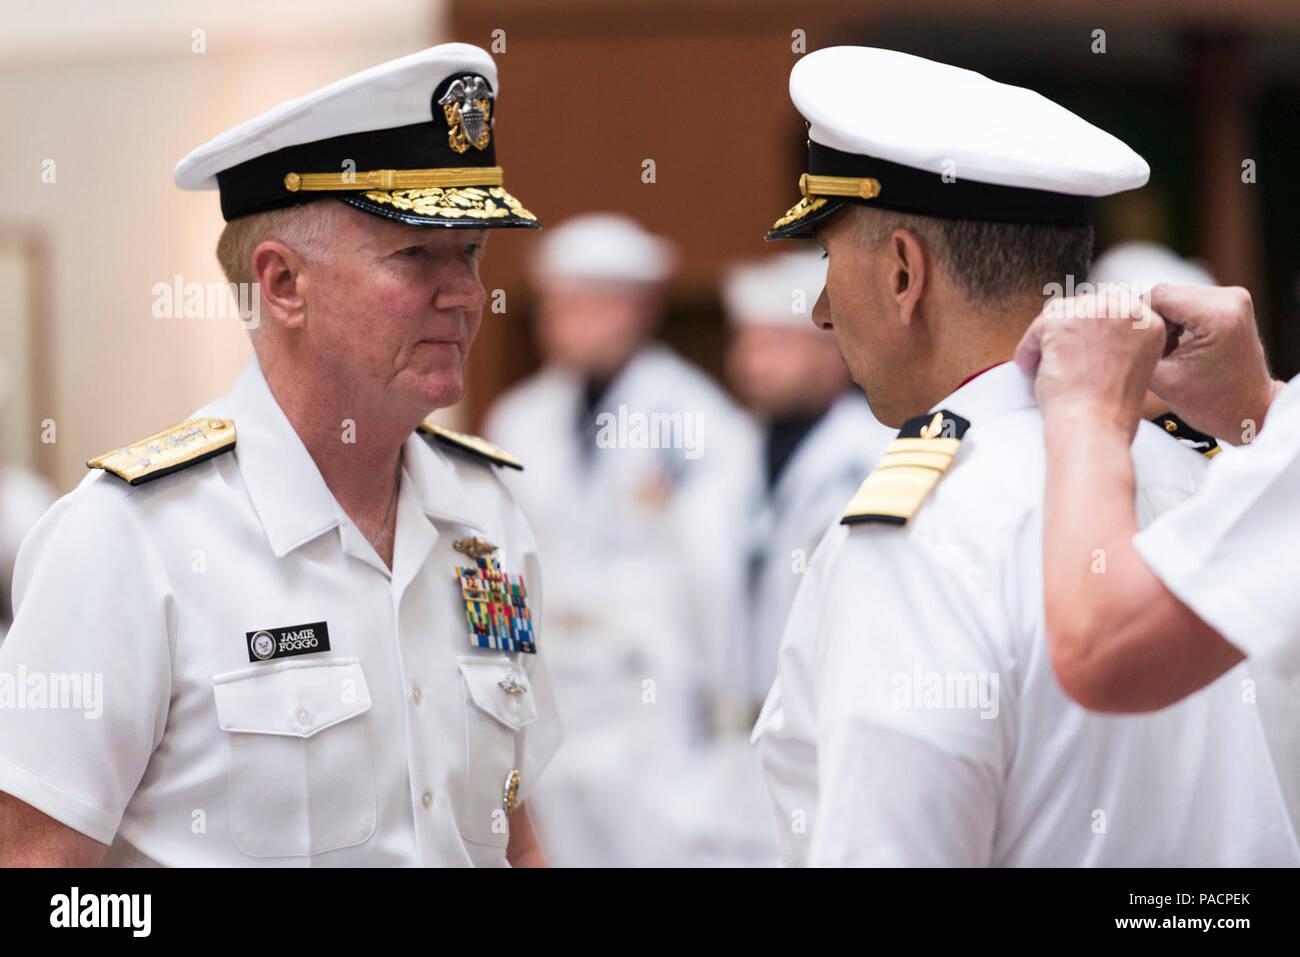 Israeli Navy Stock Photos & Israeli Navy Stock Images - Alamy